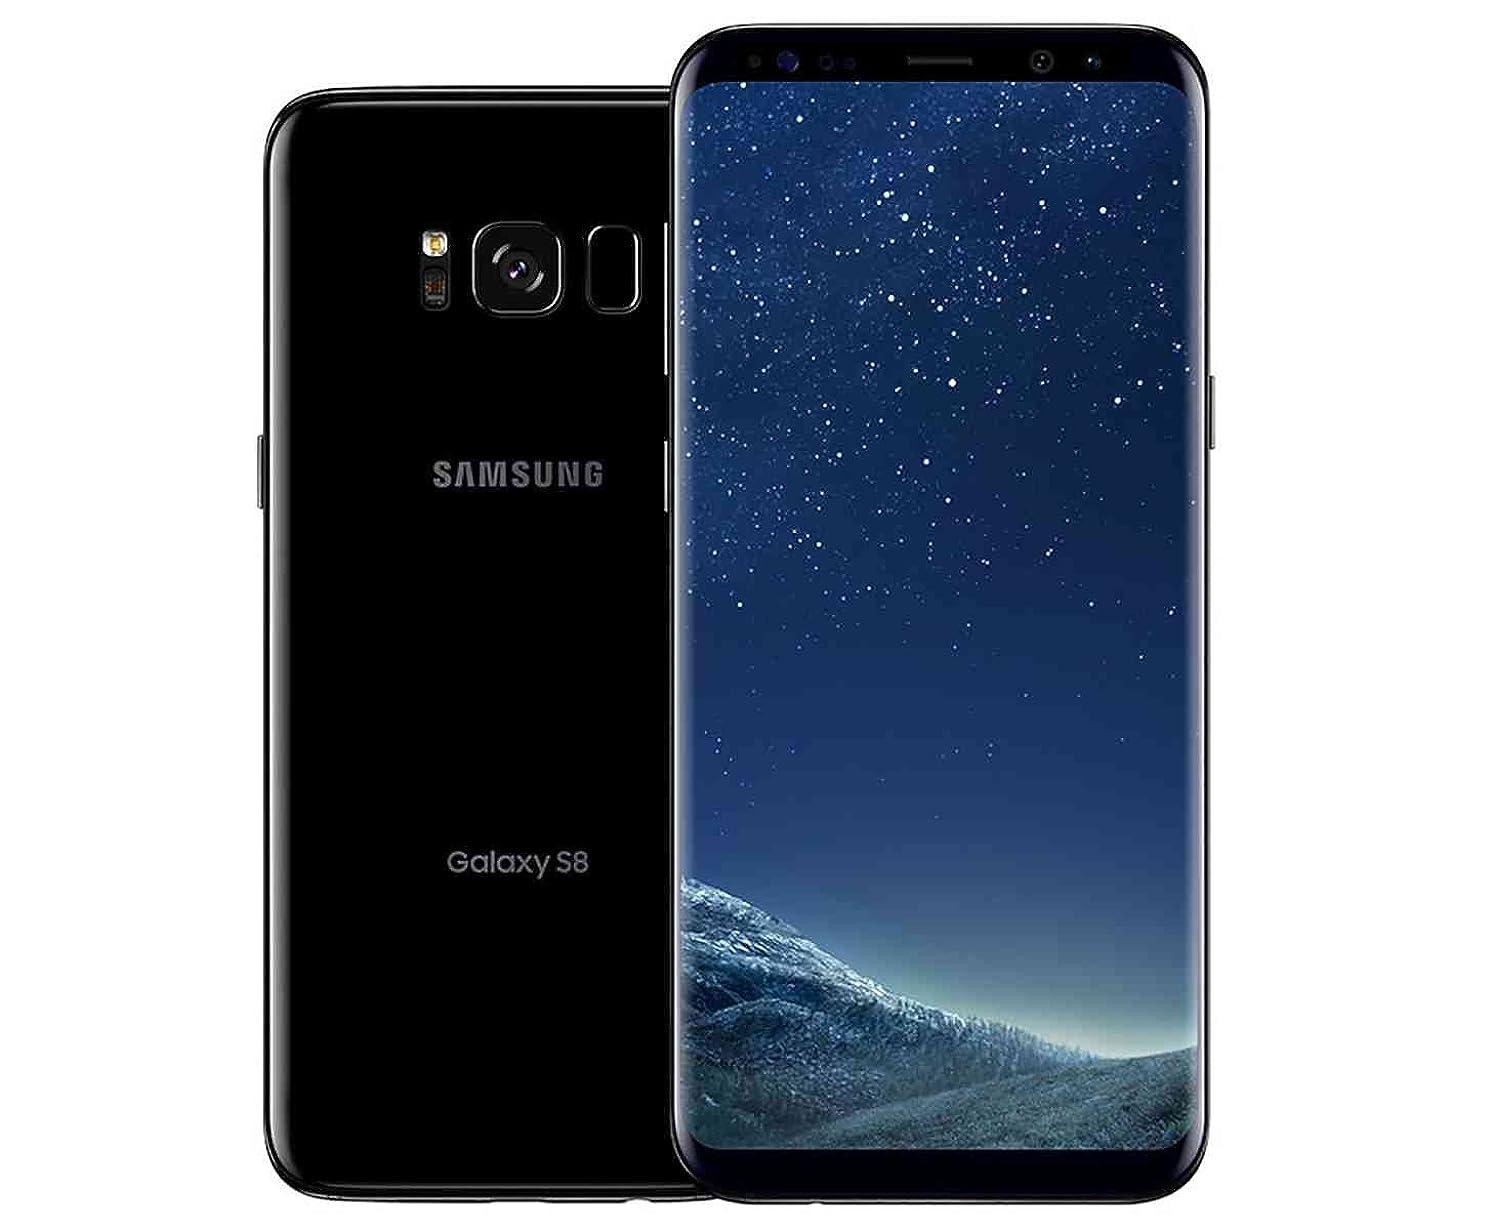 Samsung Galaxy S8 64GB Factory Unlocked Smartphone - US Version (Midnight Black) - US Warranty - [SM-G950UZKAXAA]